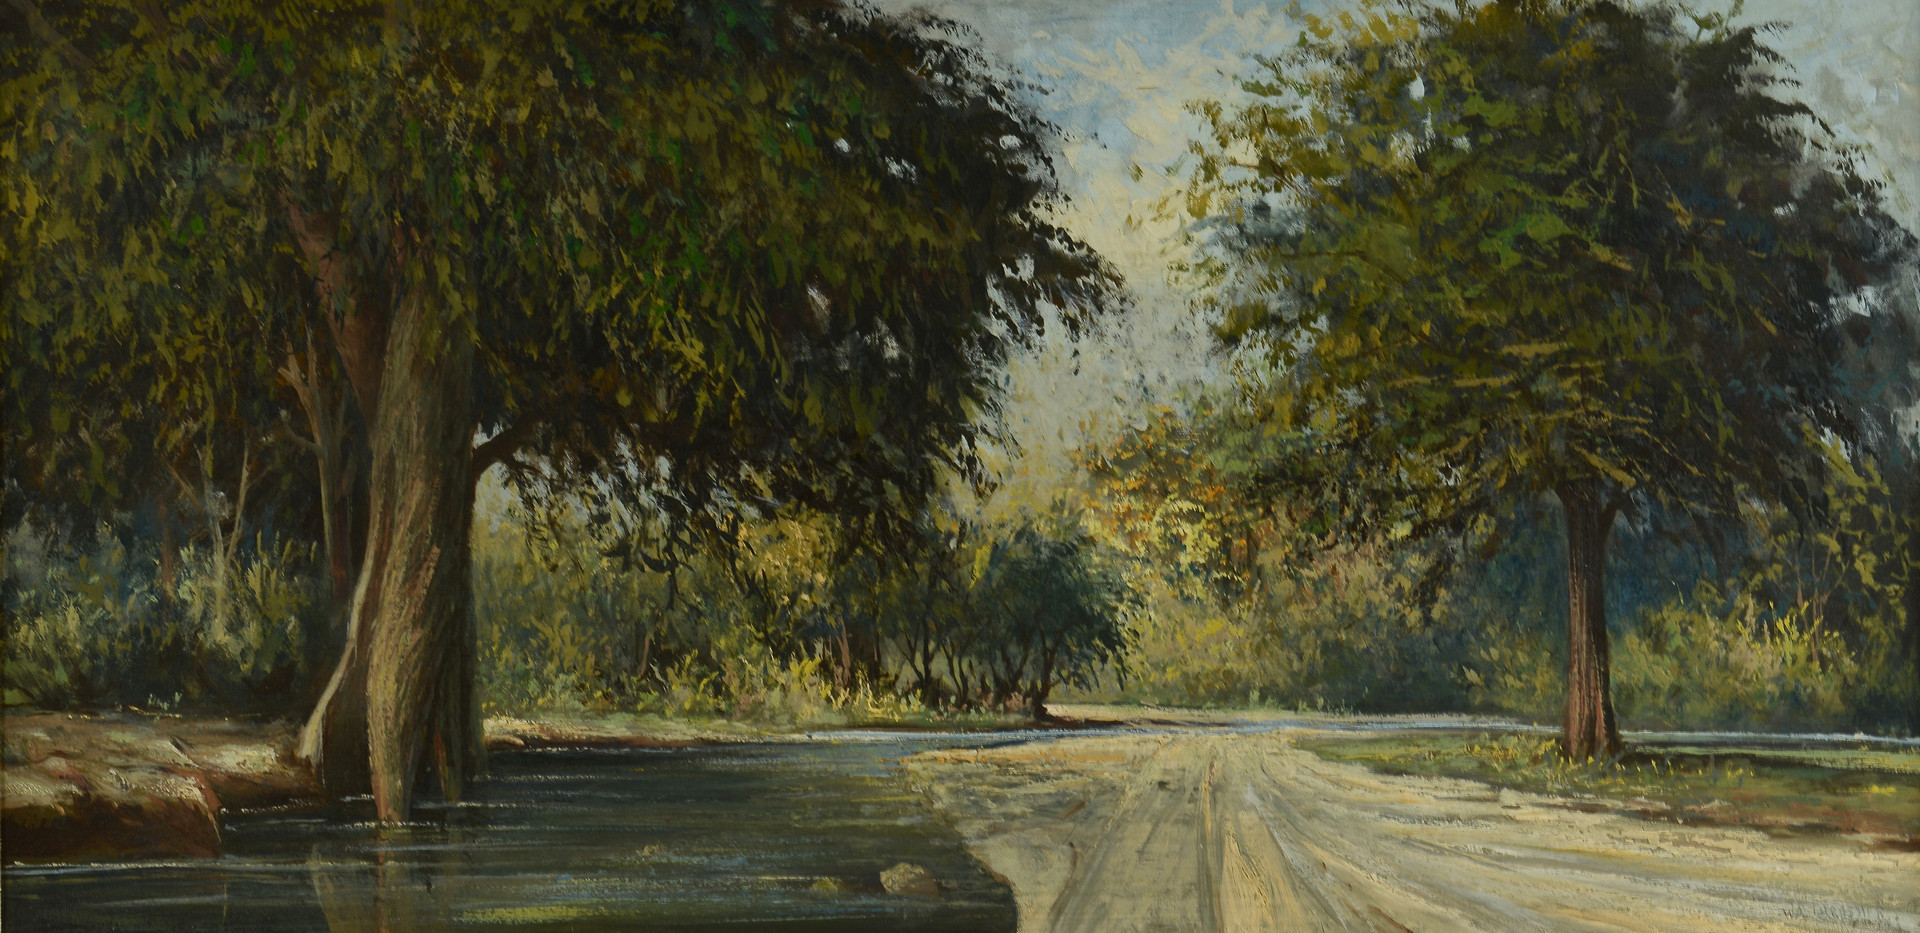 Lot 655: William R. Thrasher Landscape Painting